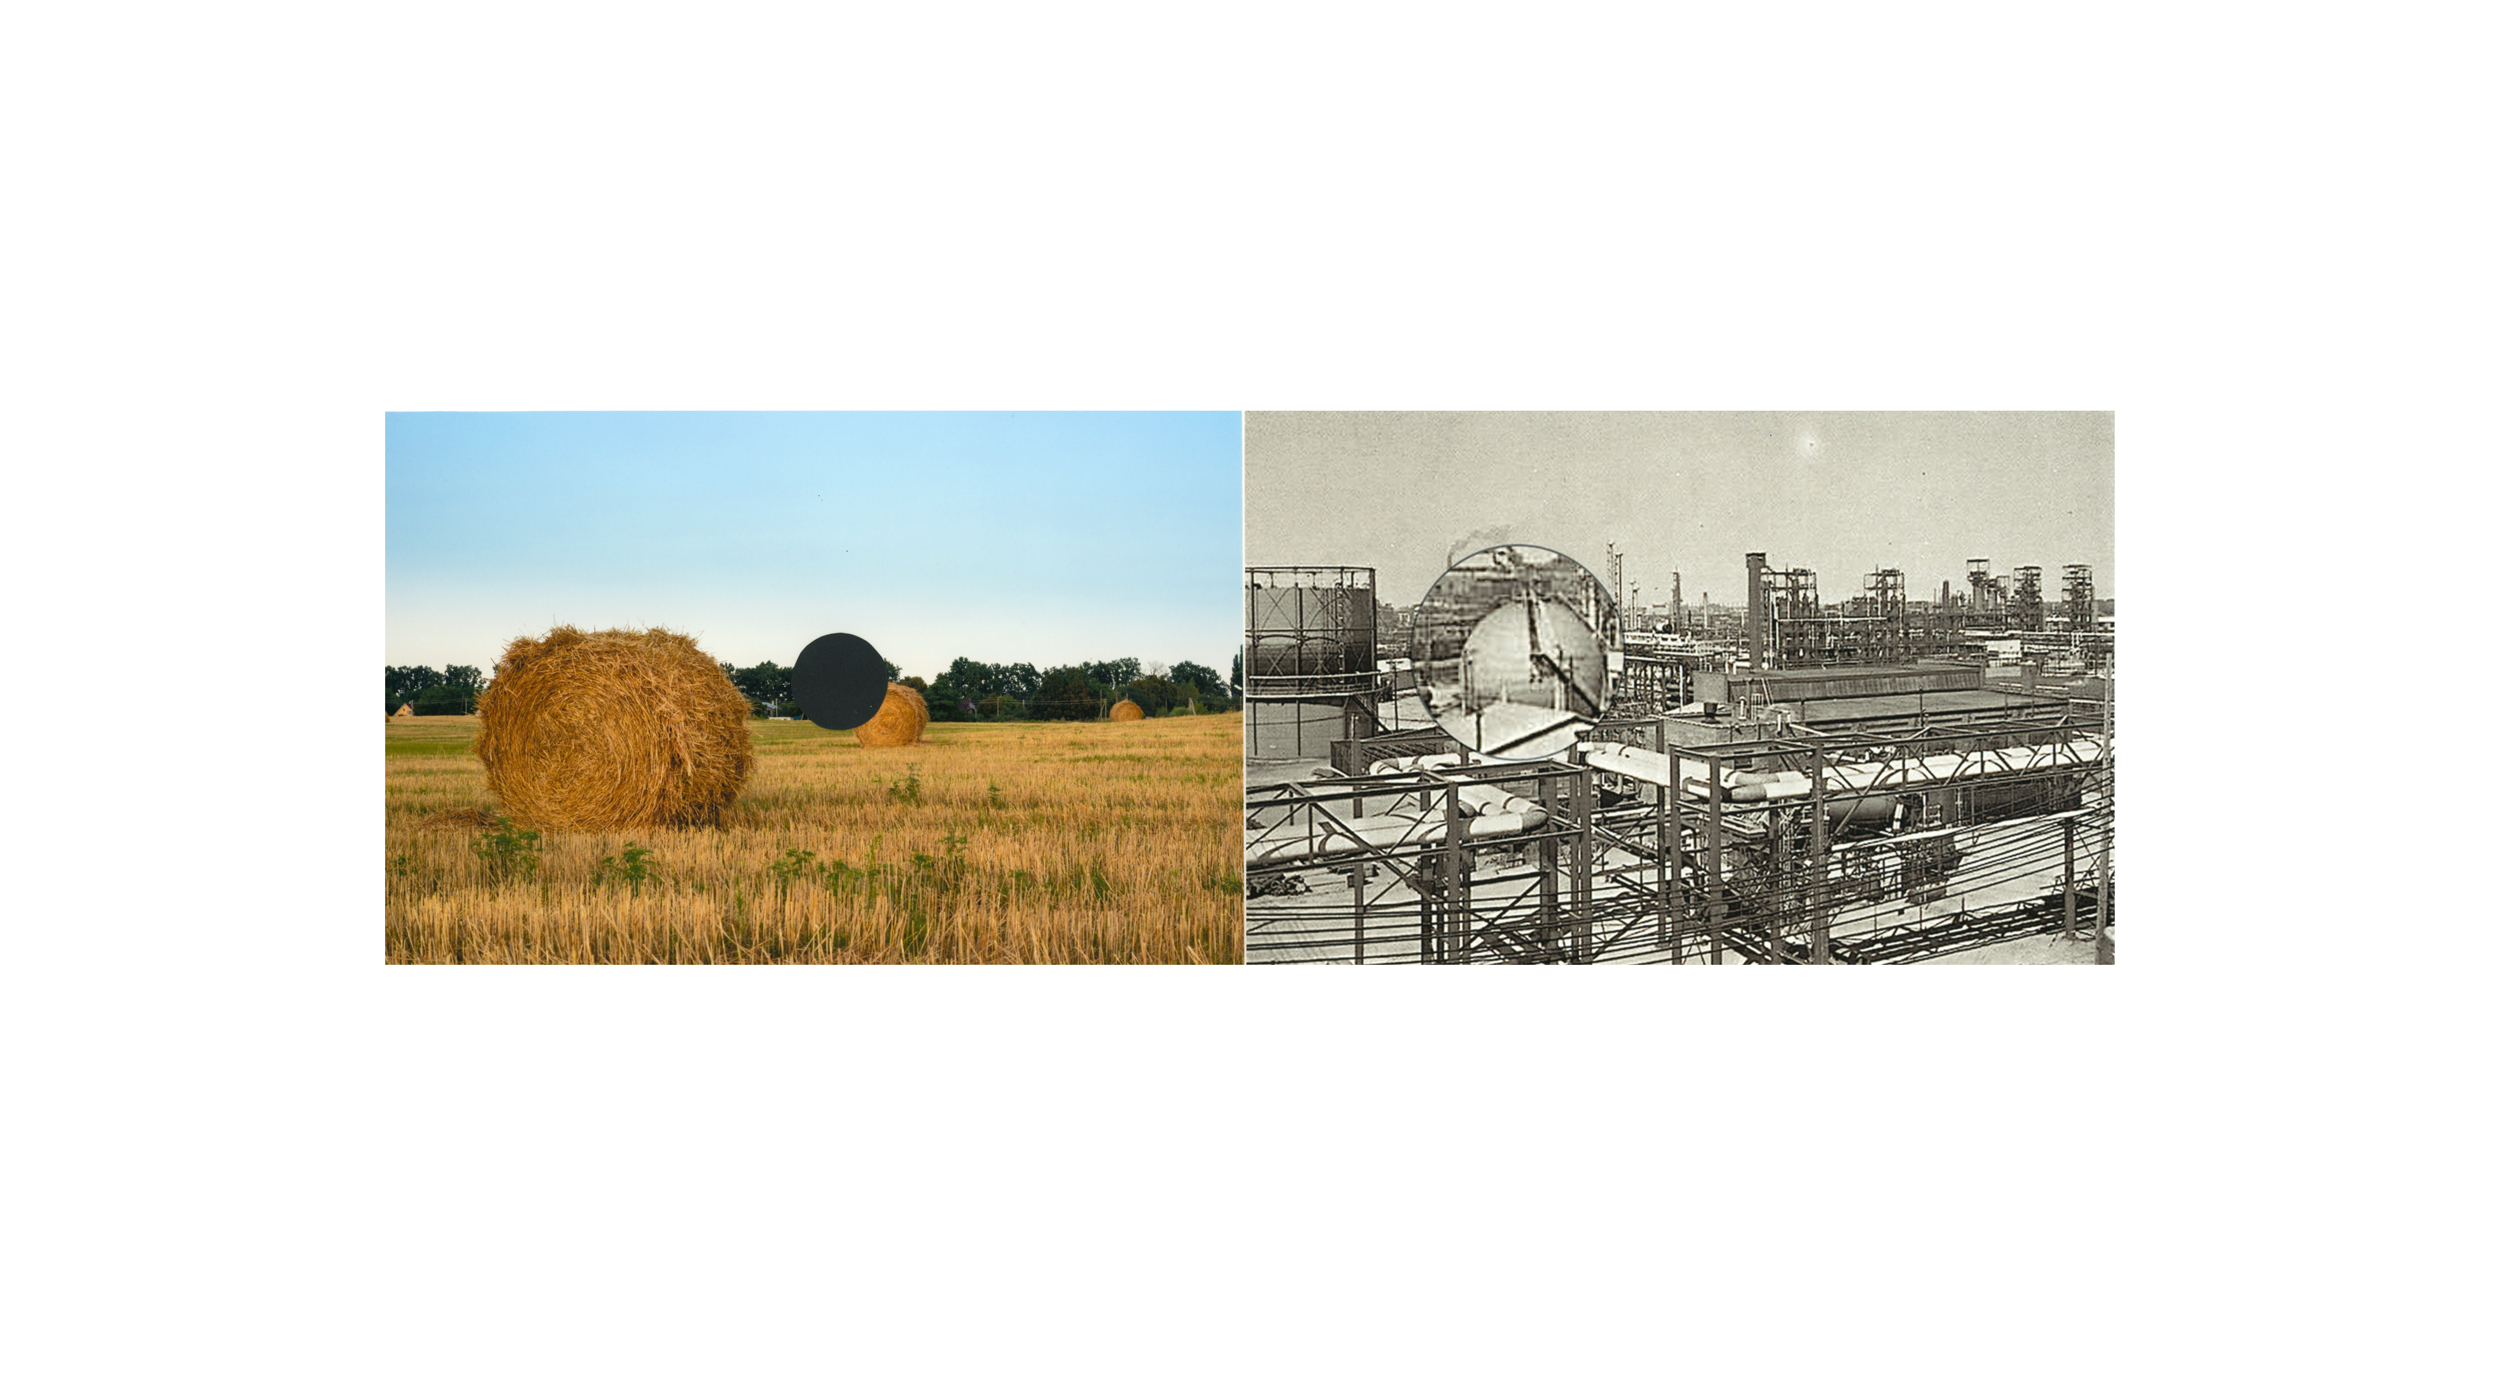 "Haystacks, c ollage, archival pigment print, 16.75"" h x 30"" w, 2018"